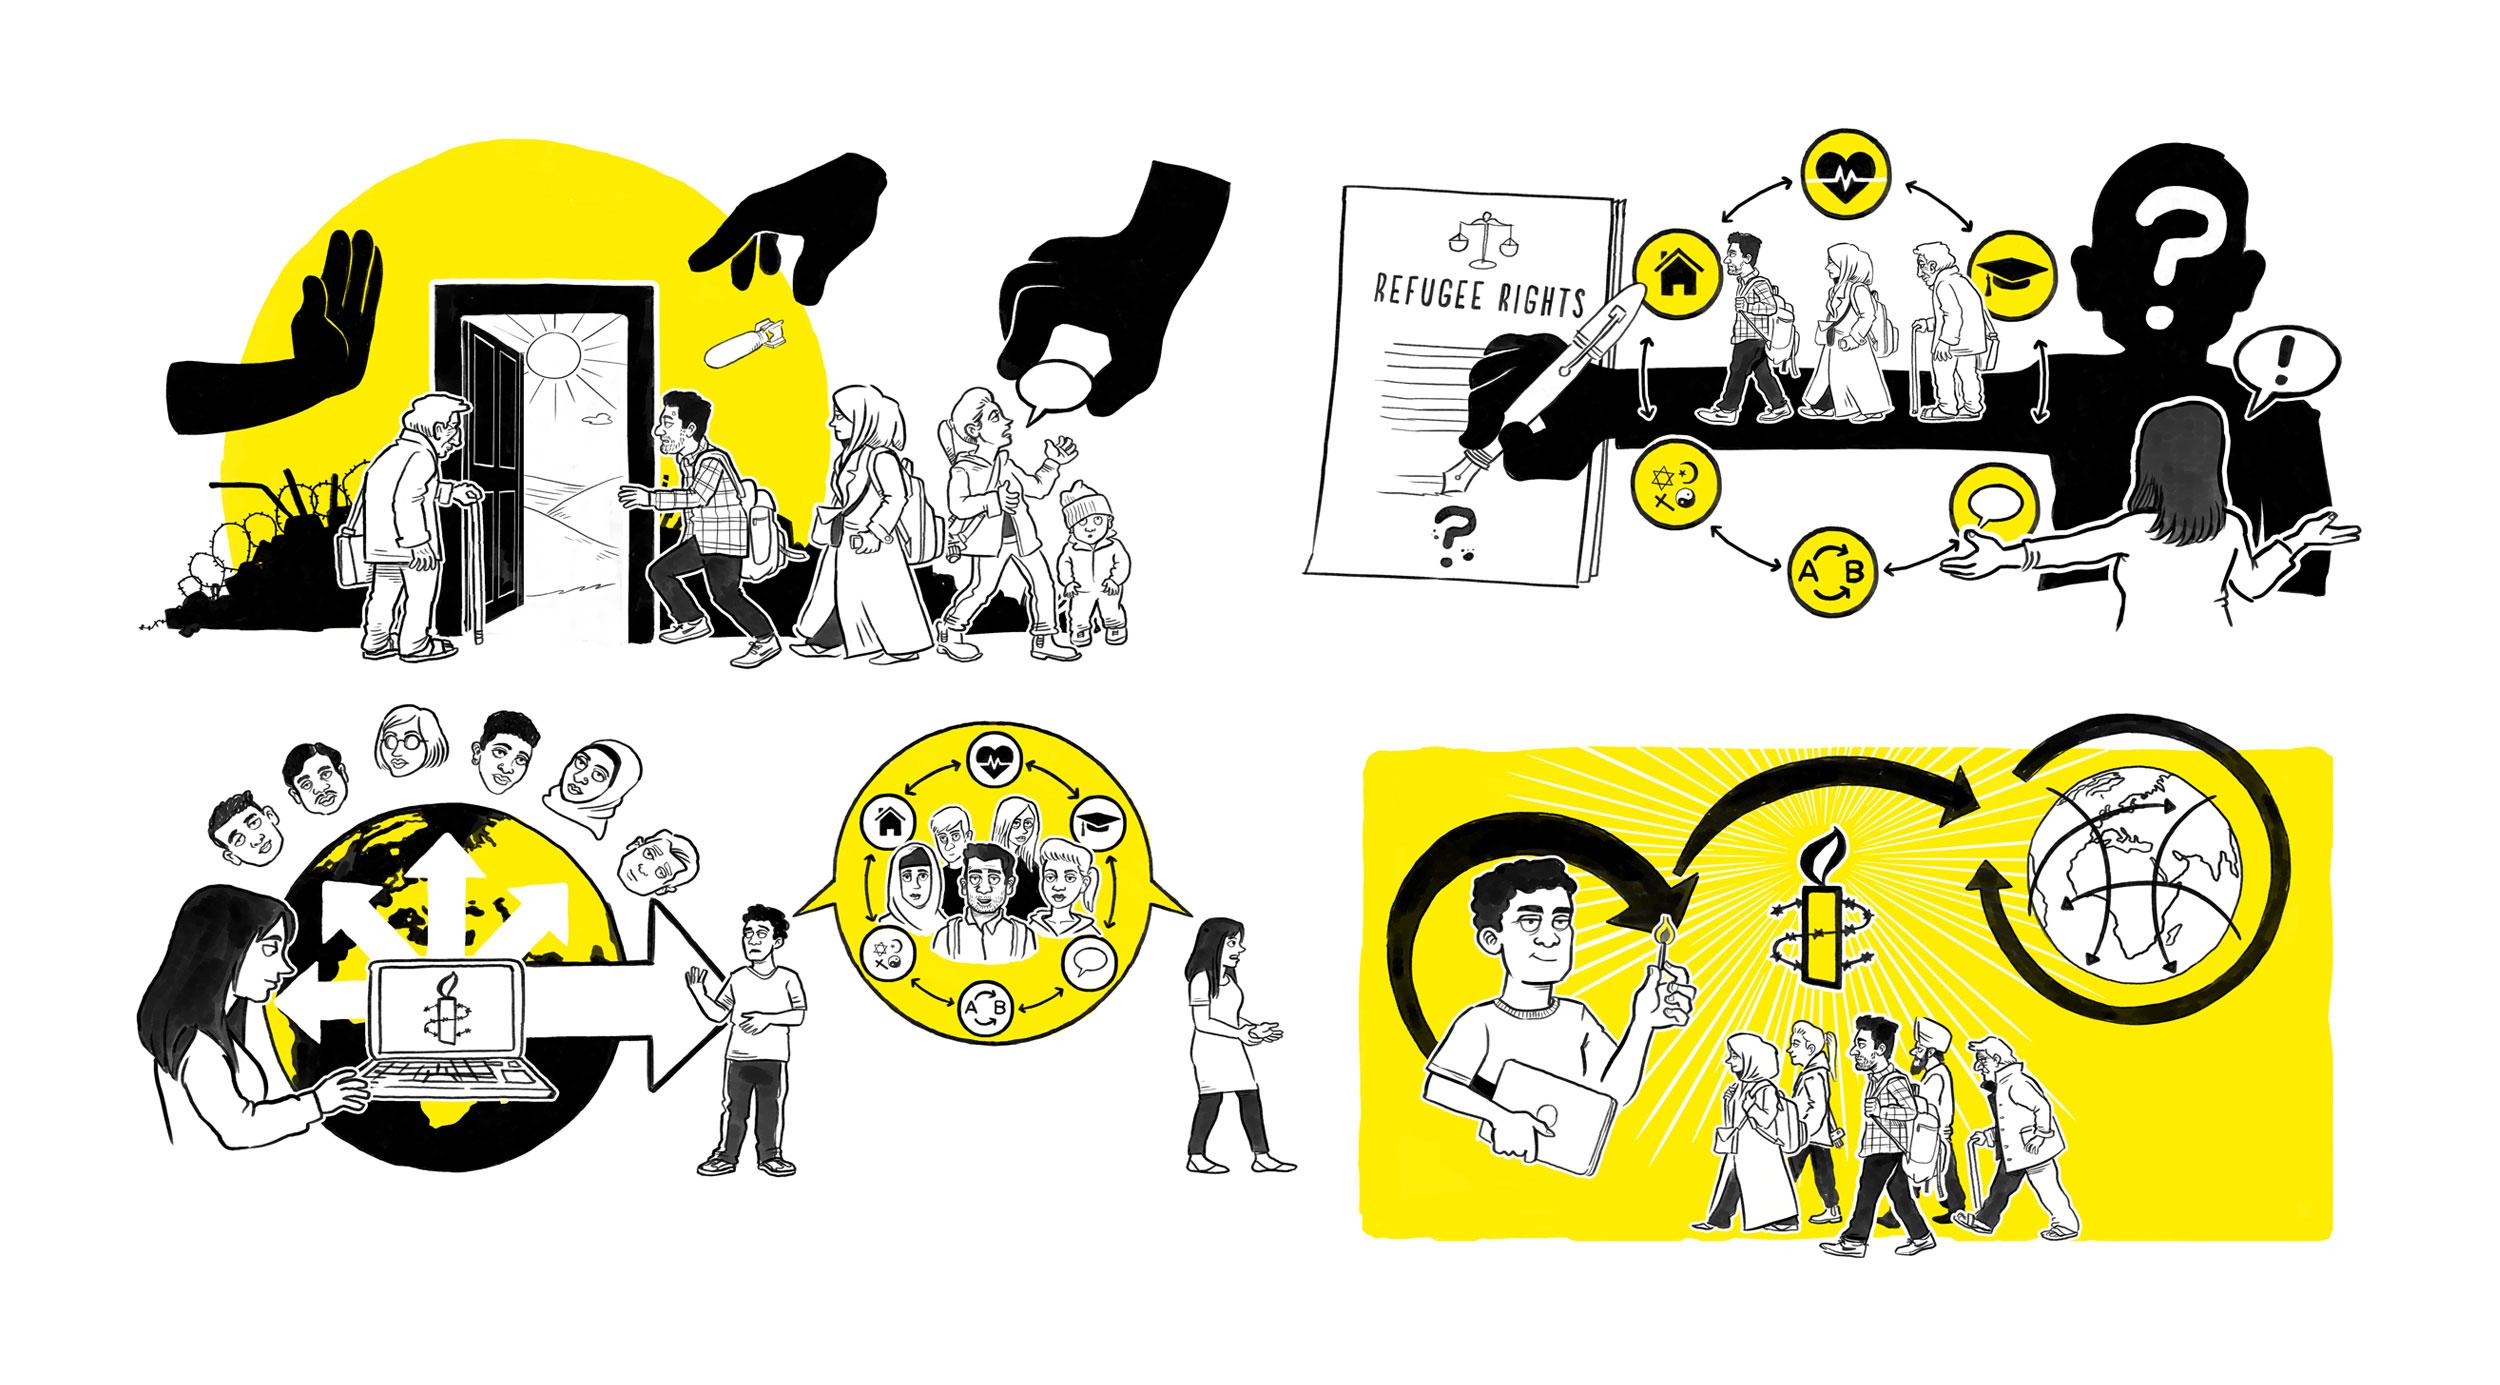 amnesty-international-promo-cognitive-08.jpg